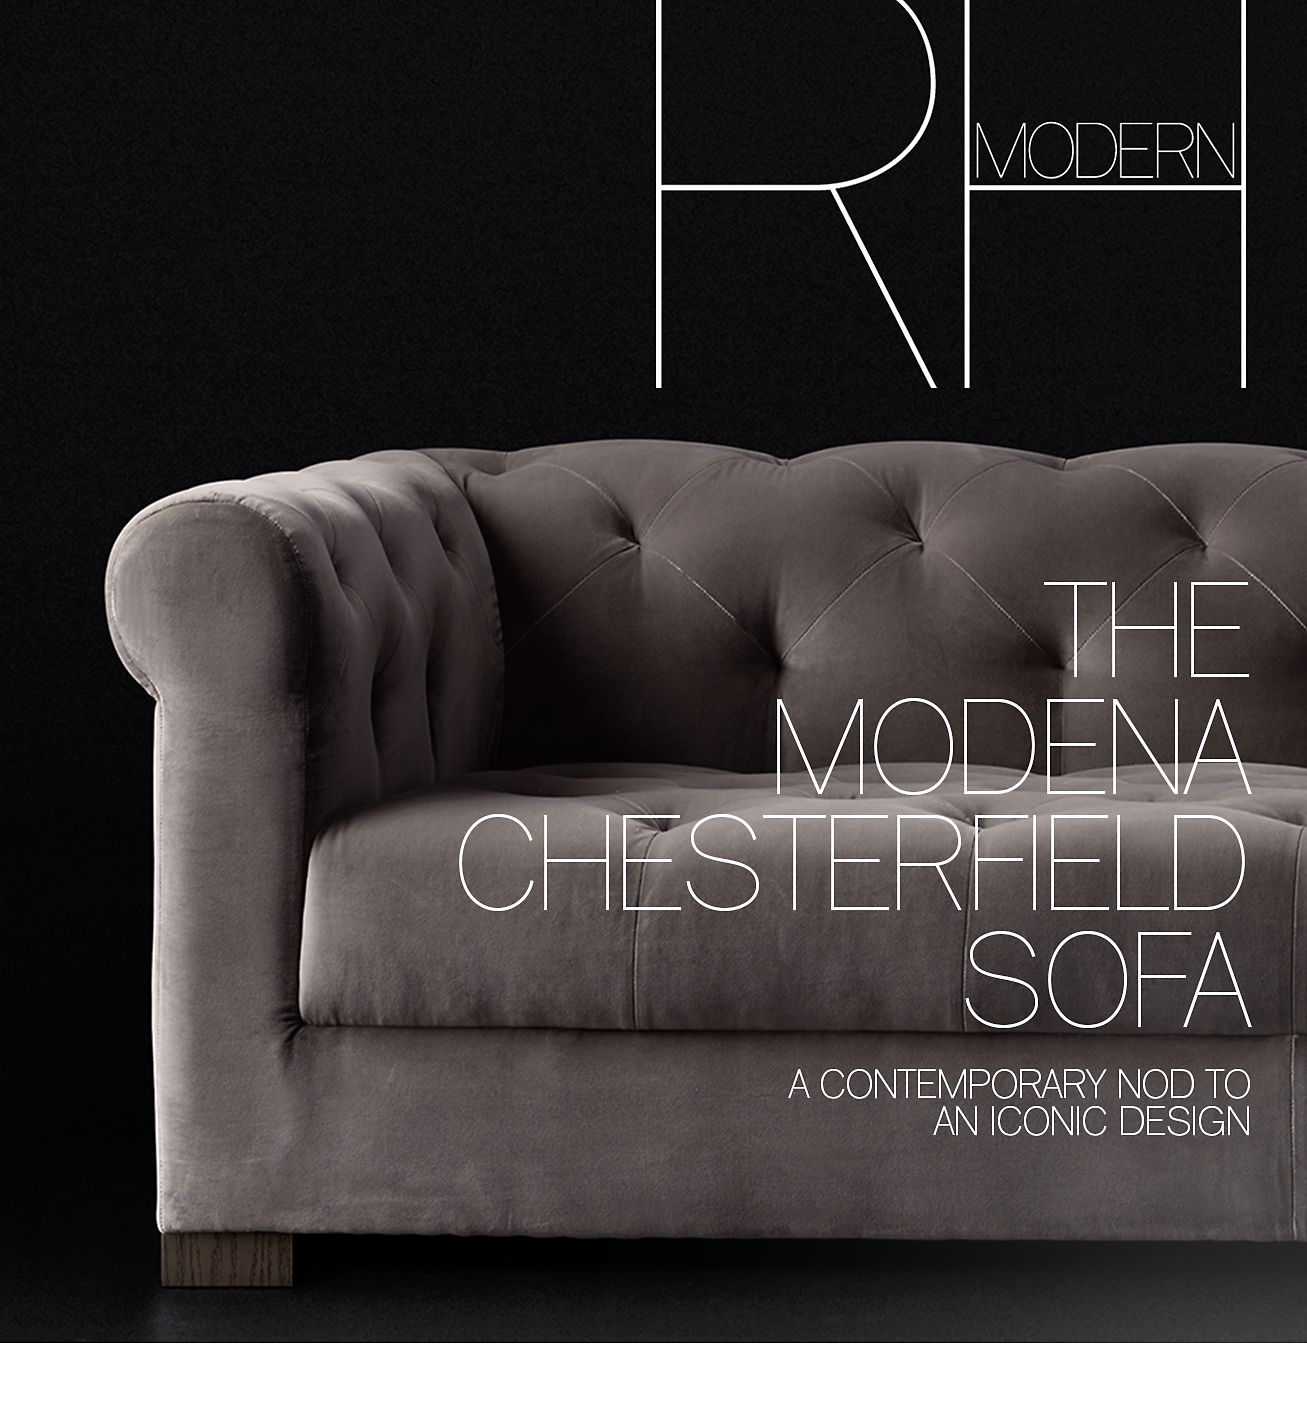 The Modena Chesterfield Sofa